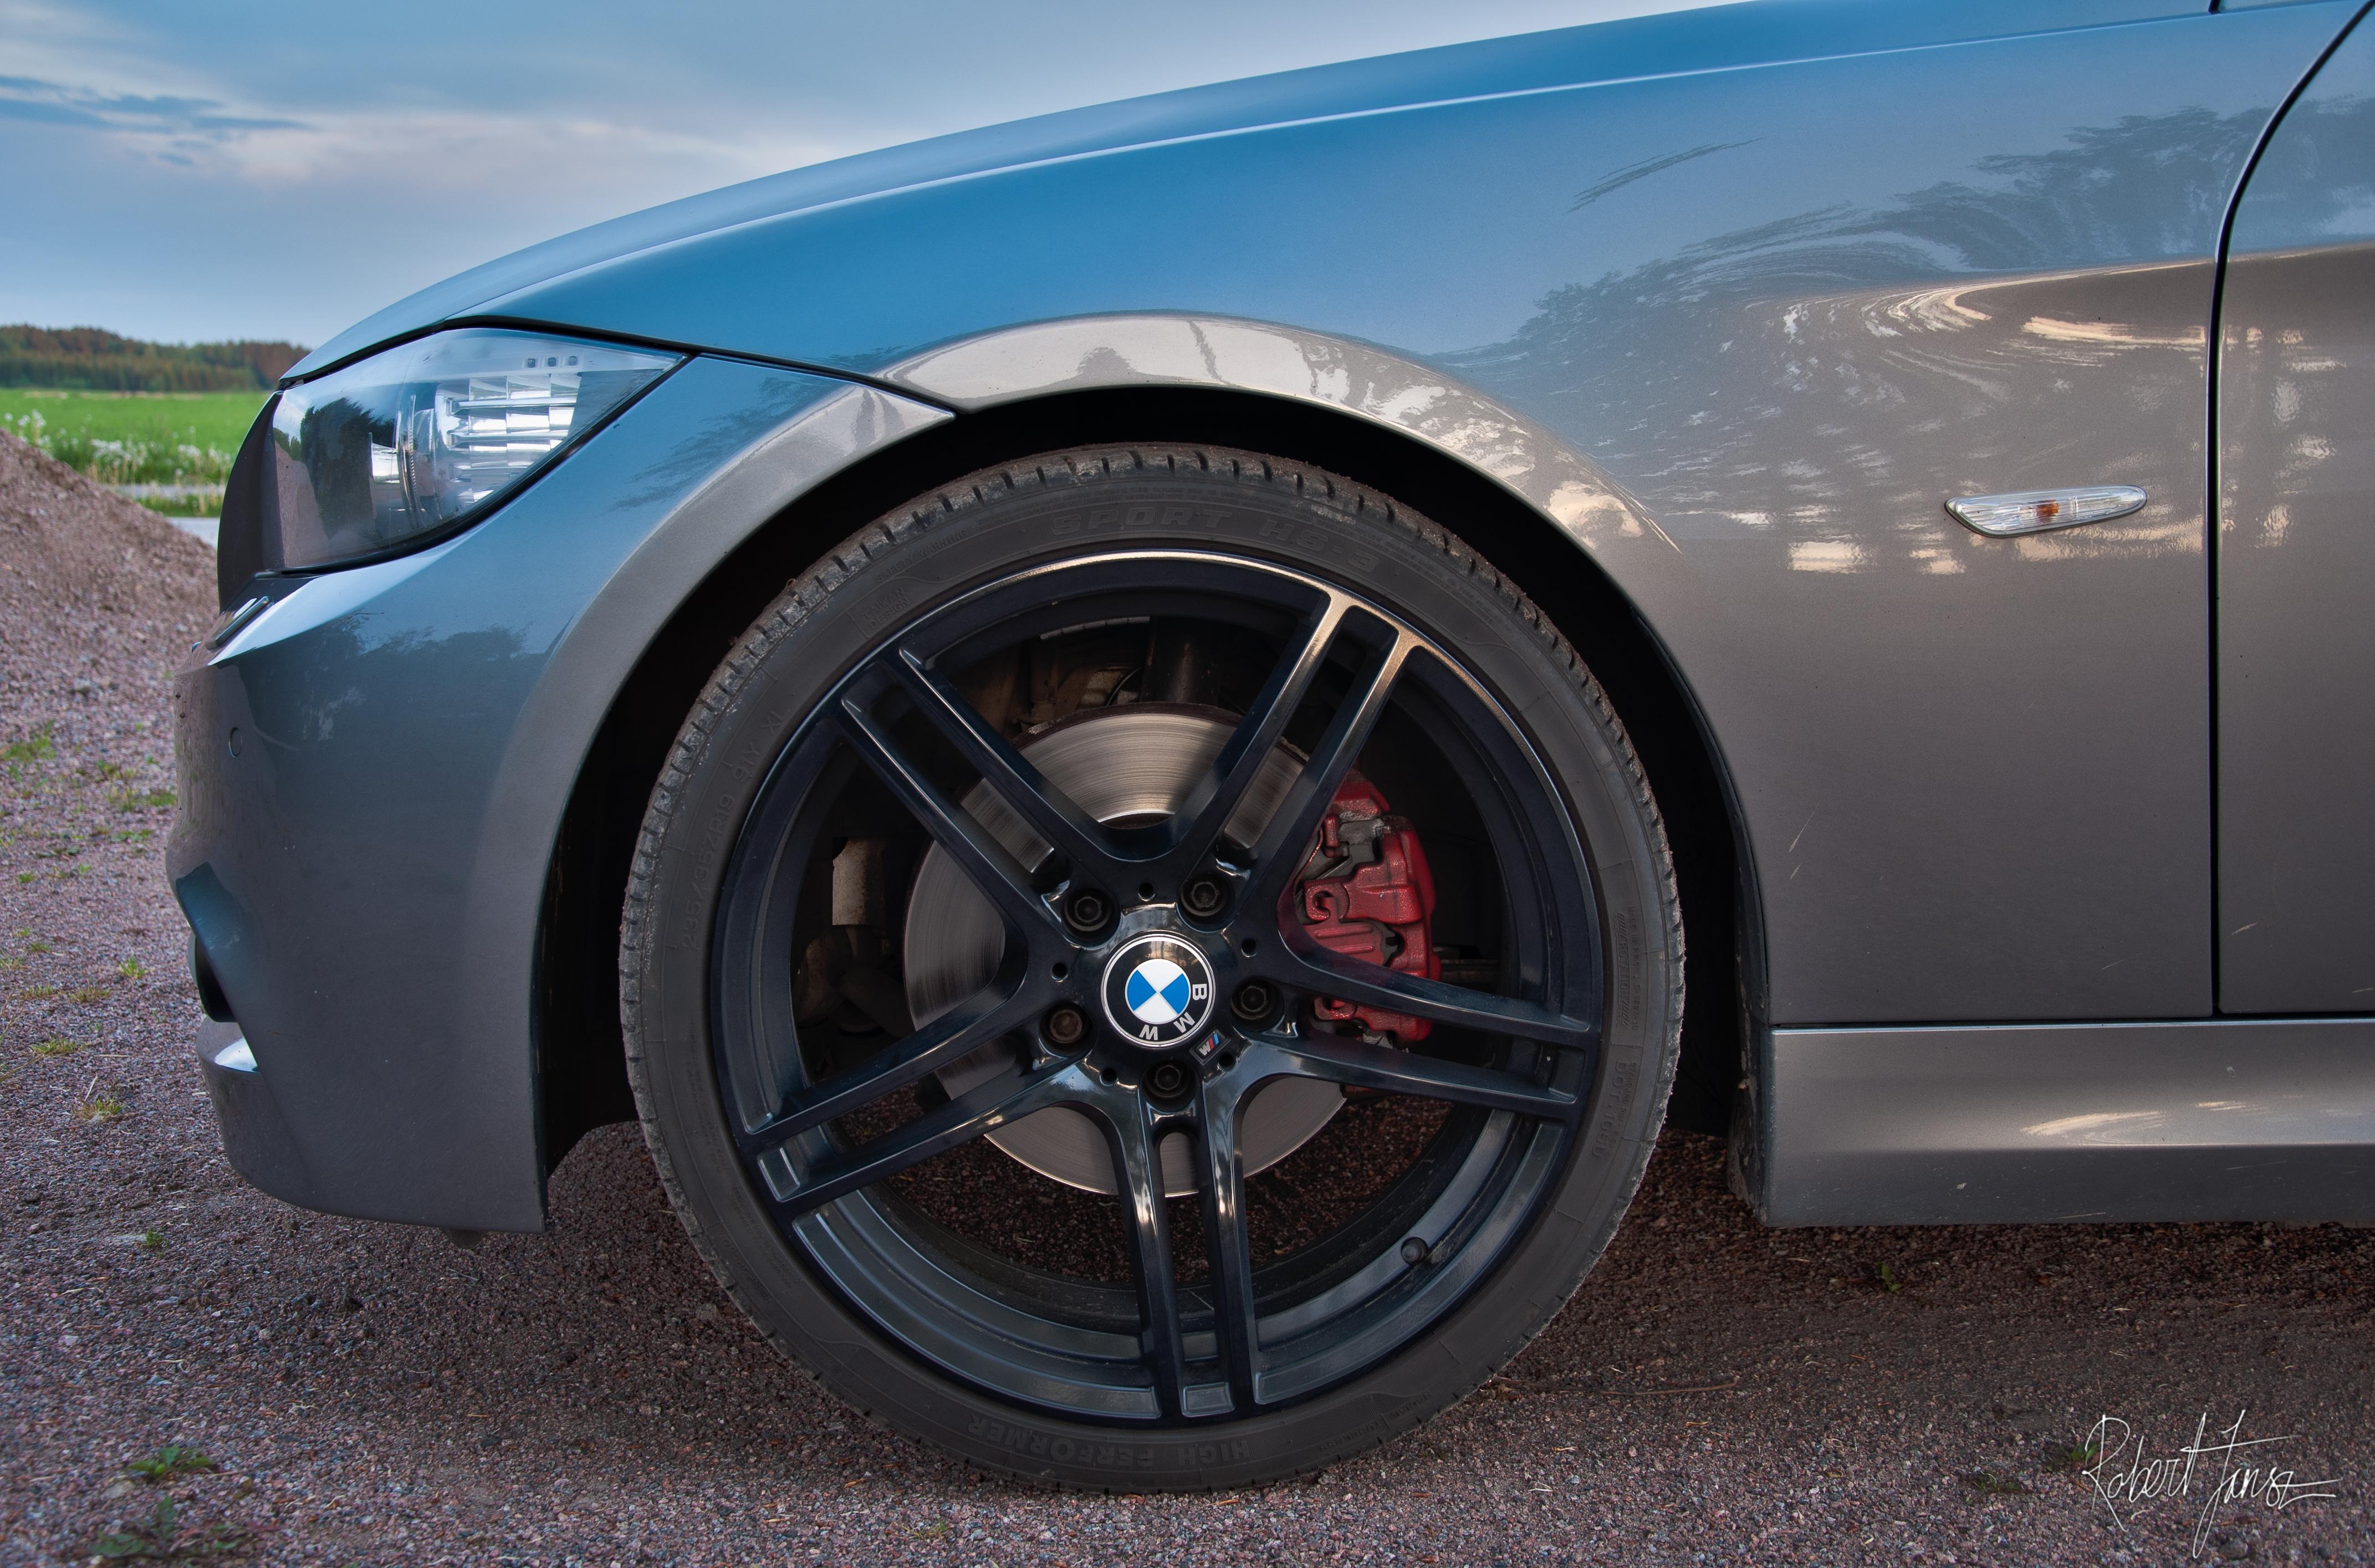 19'' bmw m performance light-alloy wheels